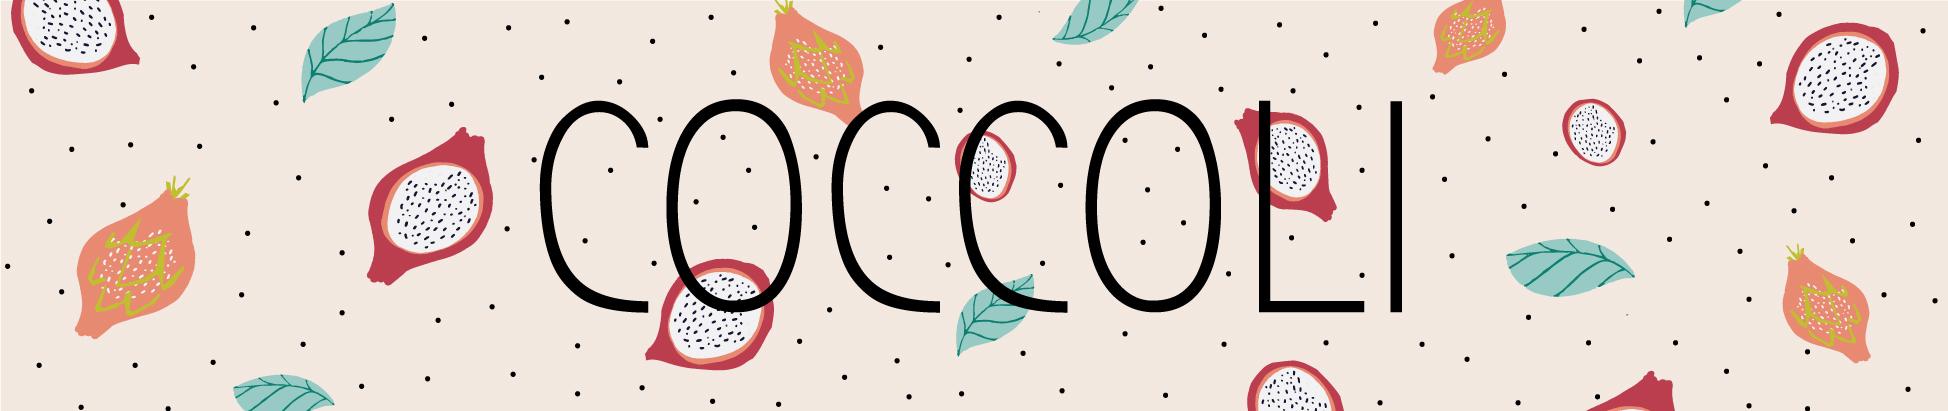 coccoli-ss20-banner-cream-2.jpg